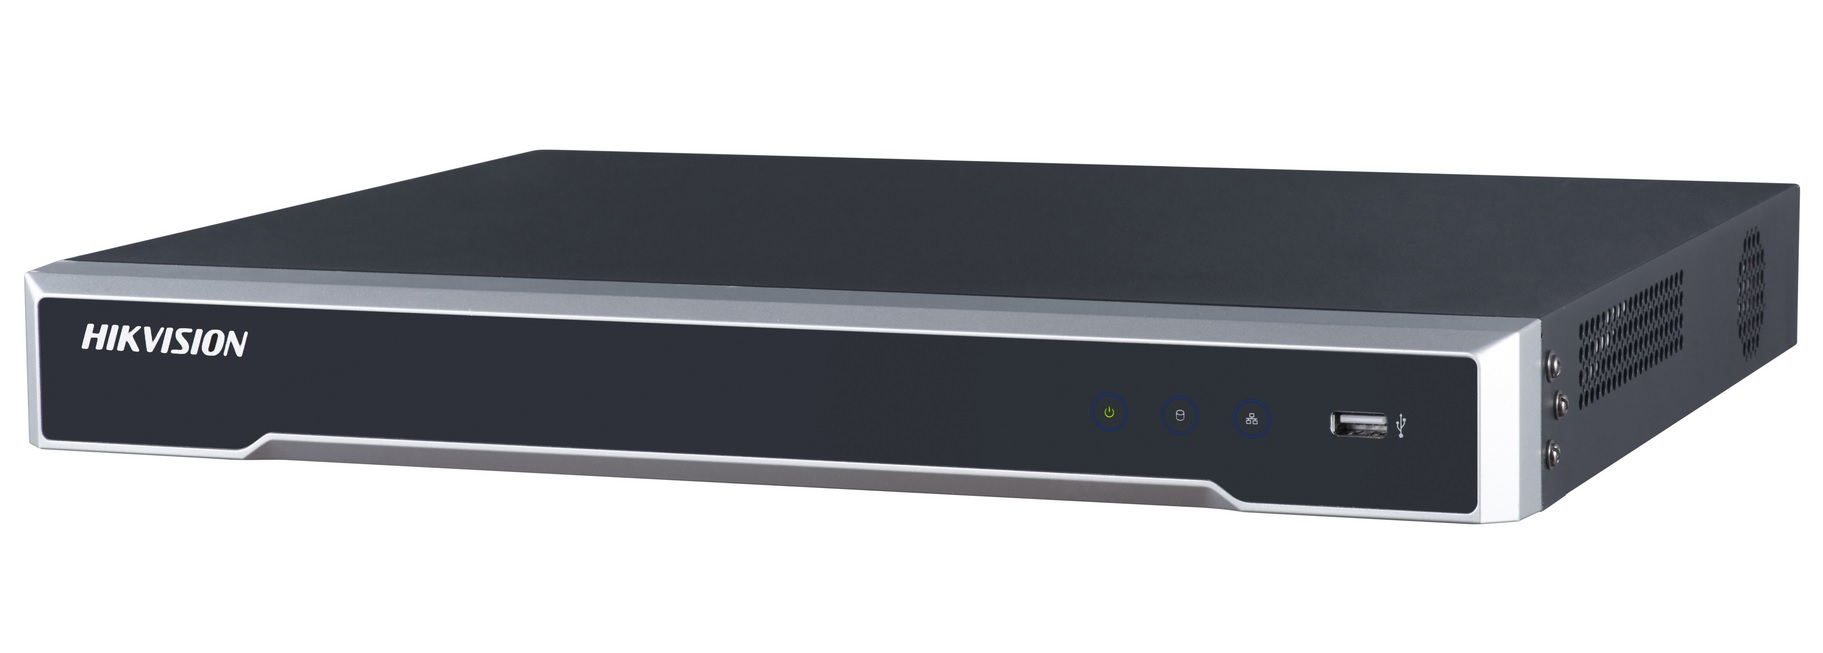 Hikvision DS-7608NI-K2 Δικτυακό NVR 8 Καμερών